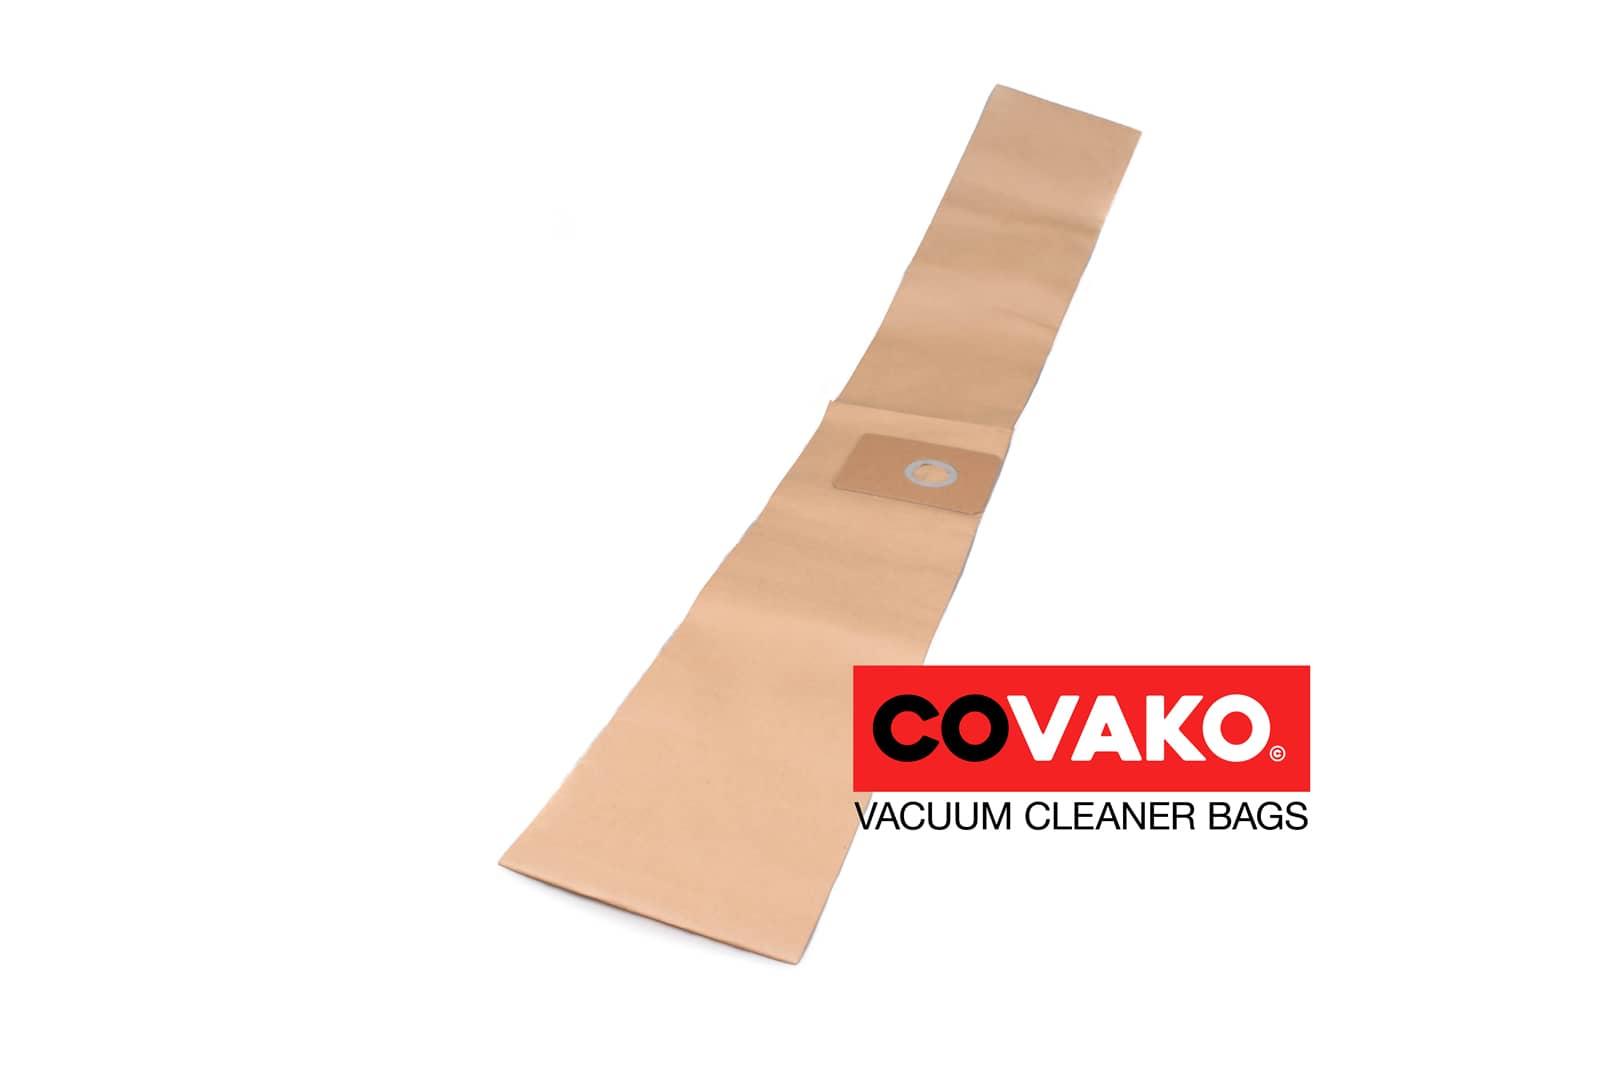 Kärcher T 201 / Paper - Kärcher vacuum cleaner bags